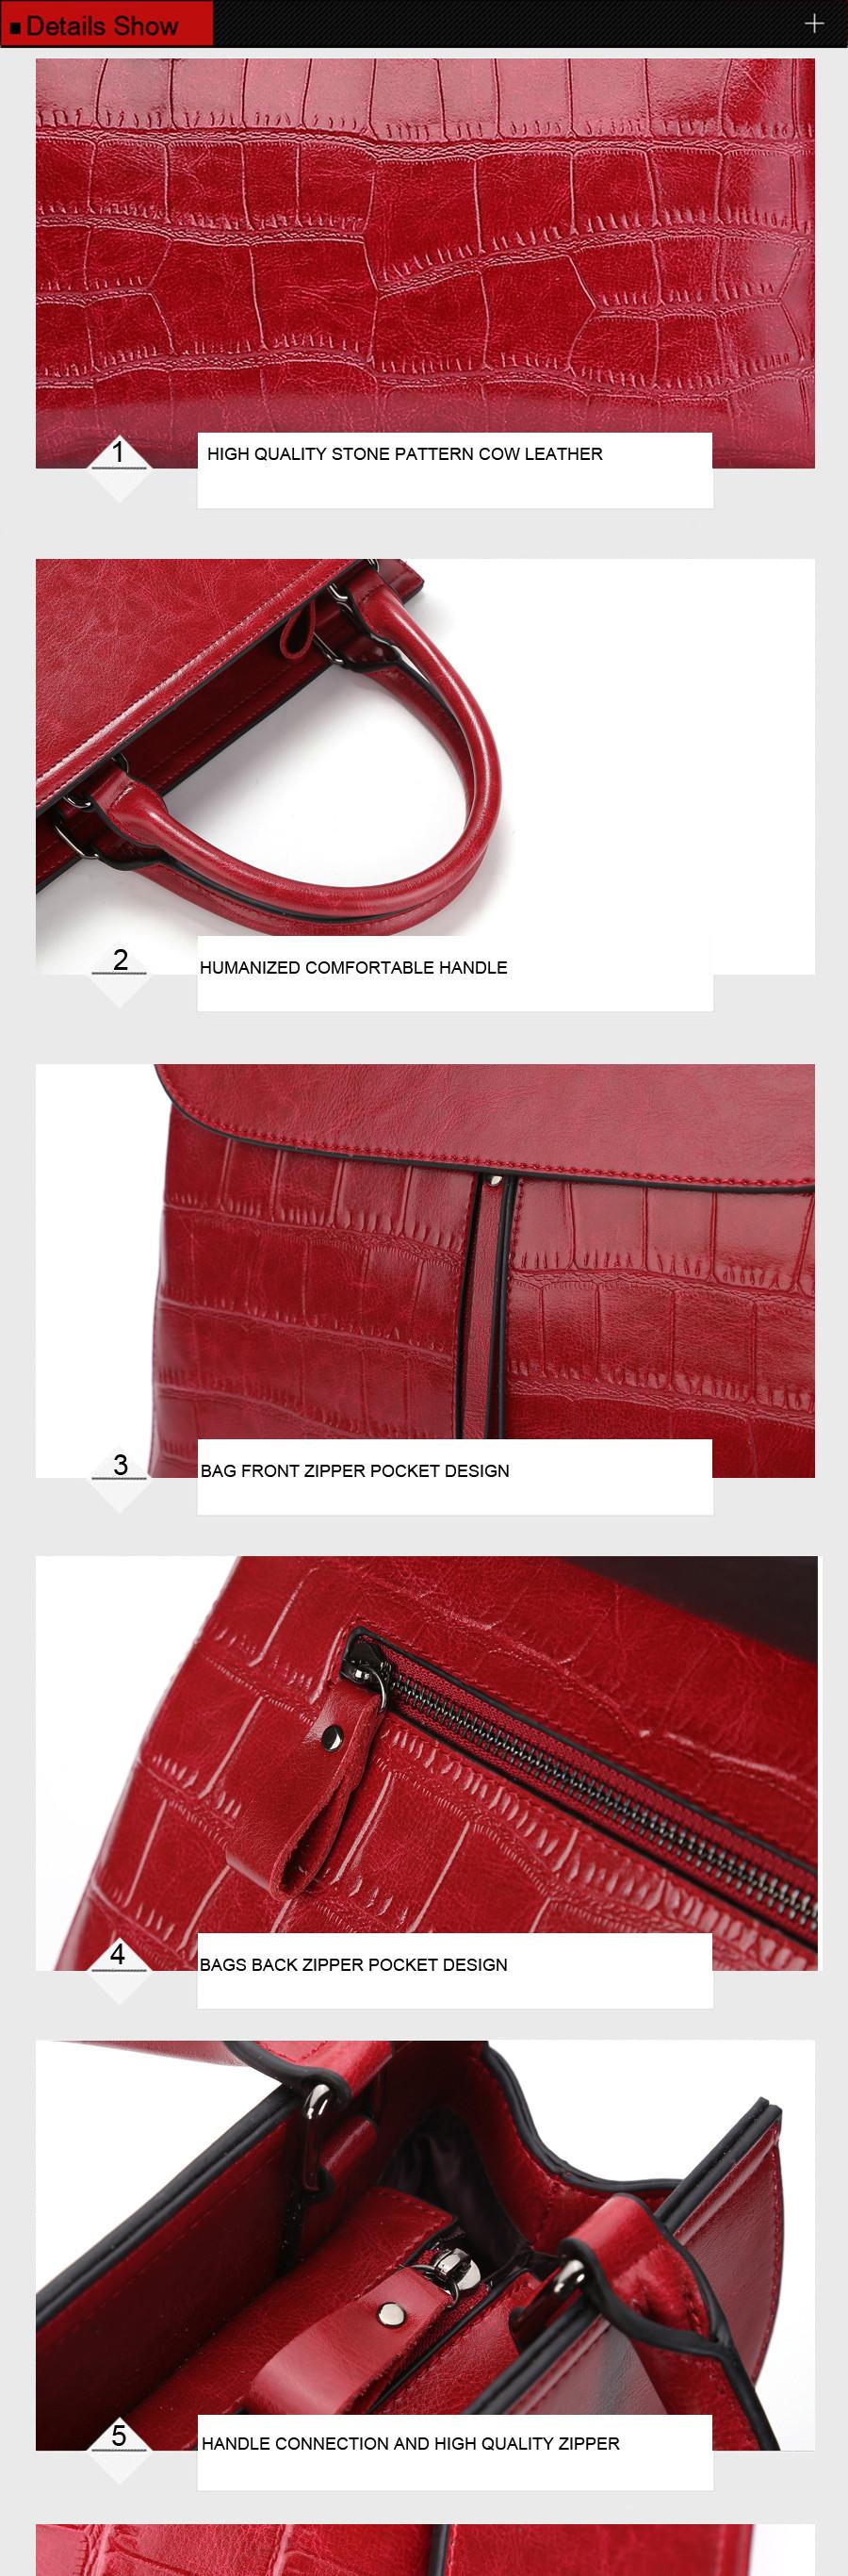 900woman-handbag5_01